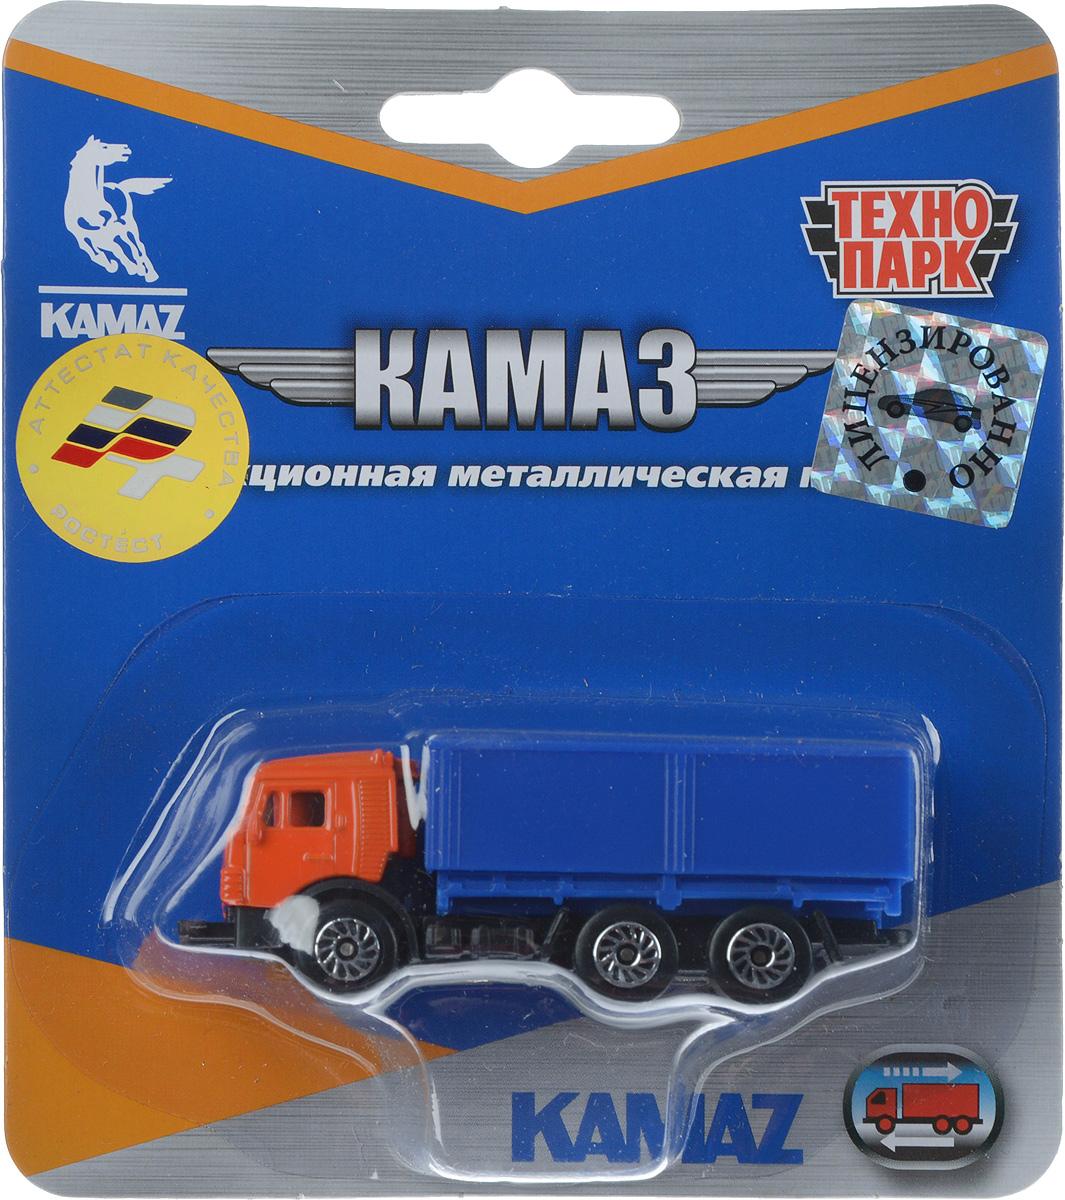 ТехноПарк Модель автомобиля Камаз цвет оранжевый синий